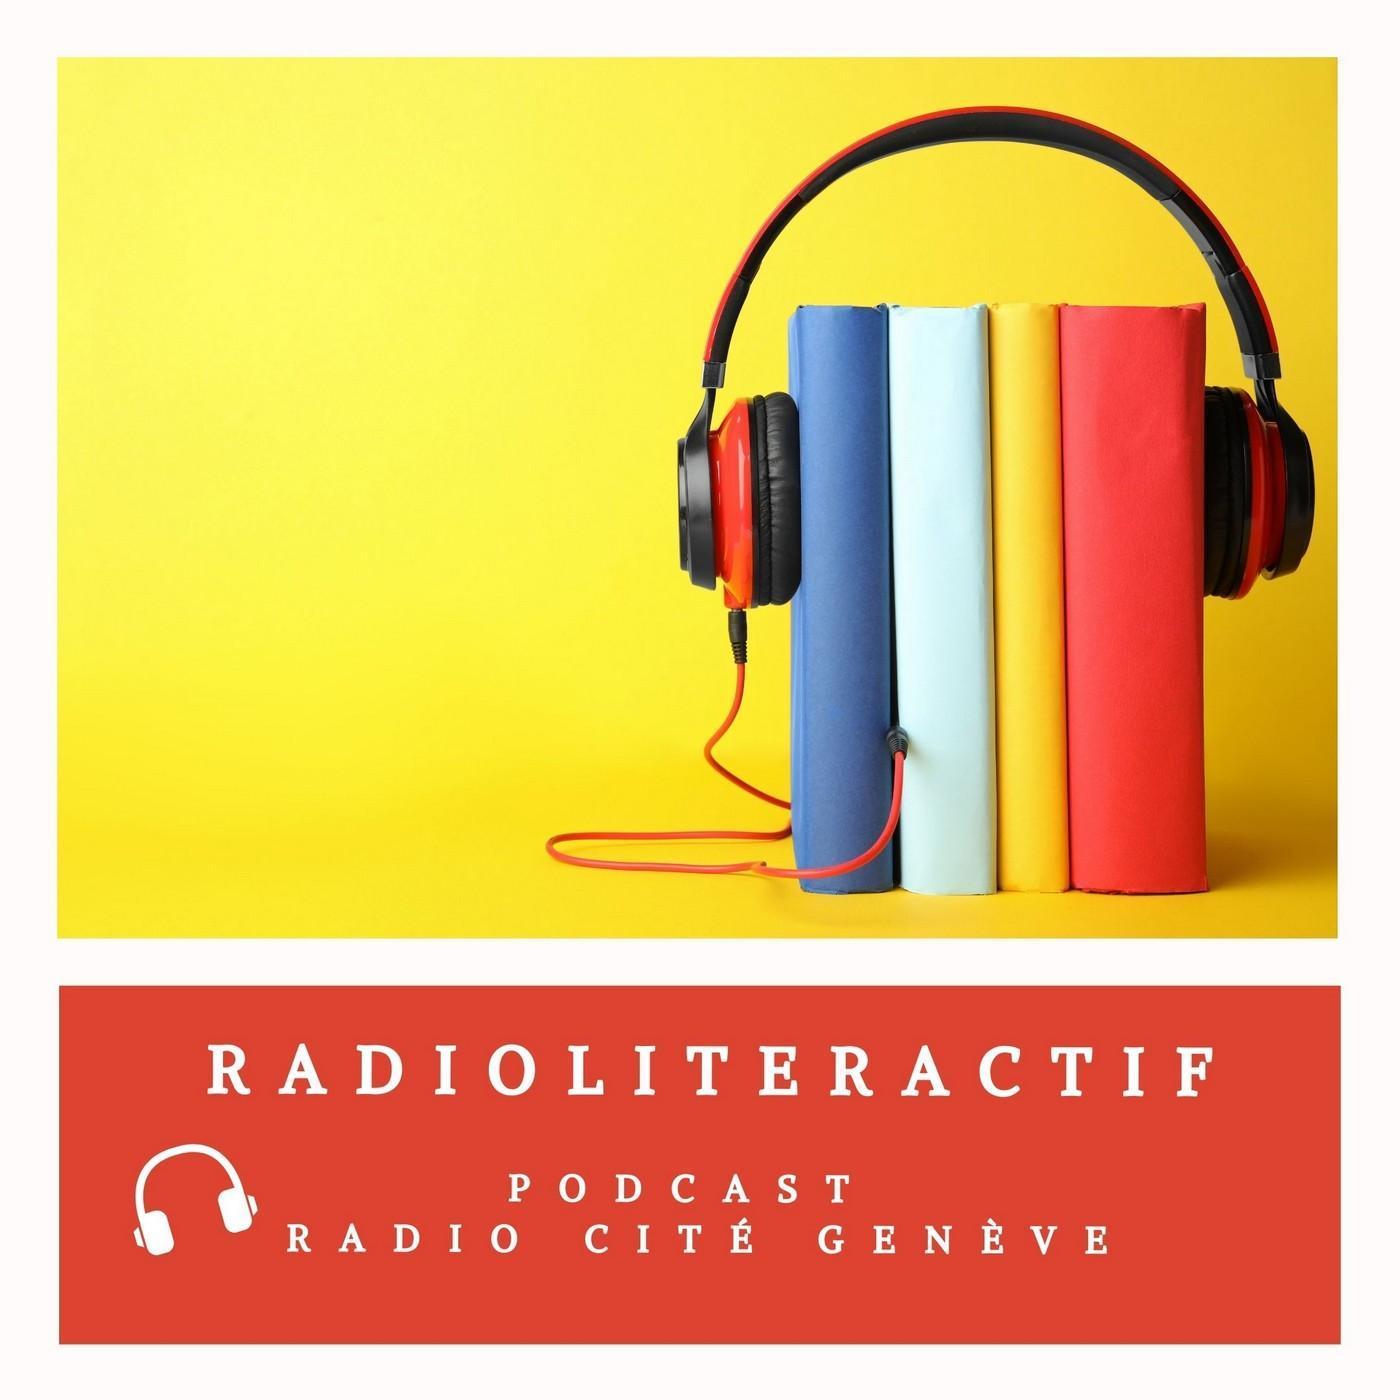 Radioliteractif du 19/07/2021 -  Judith Collet